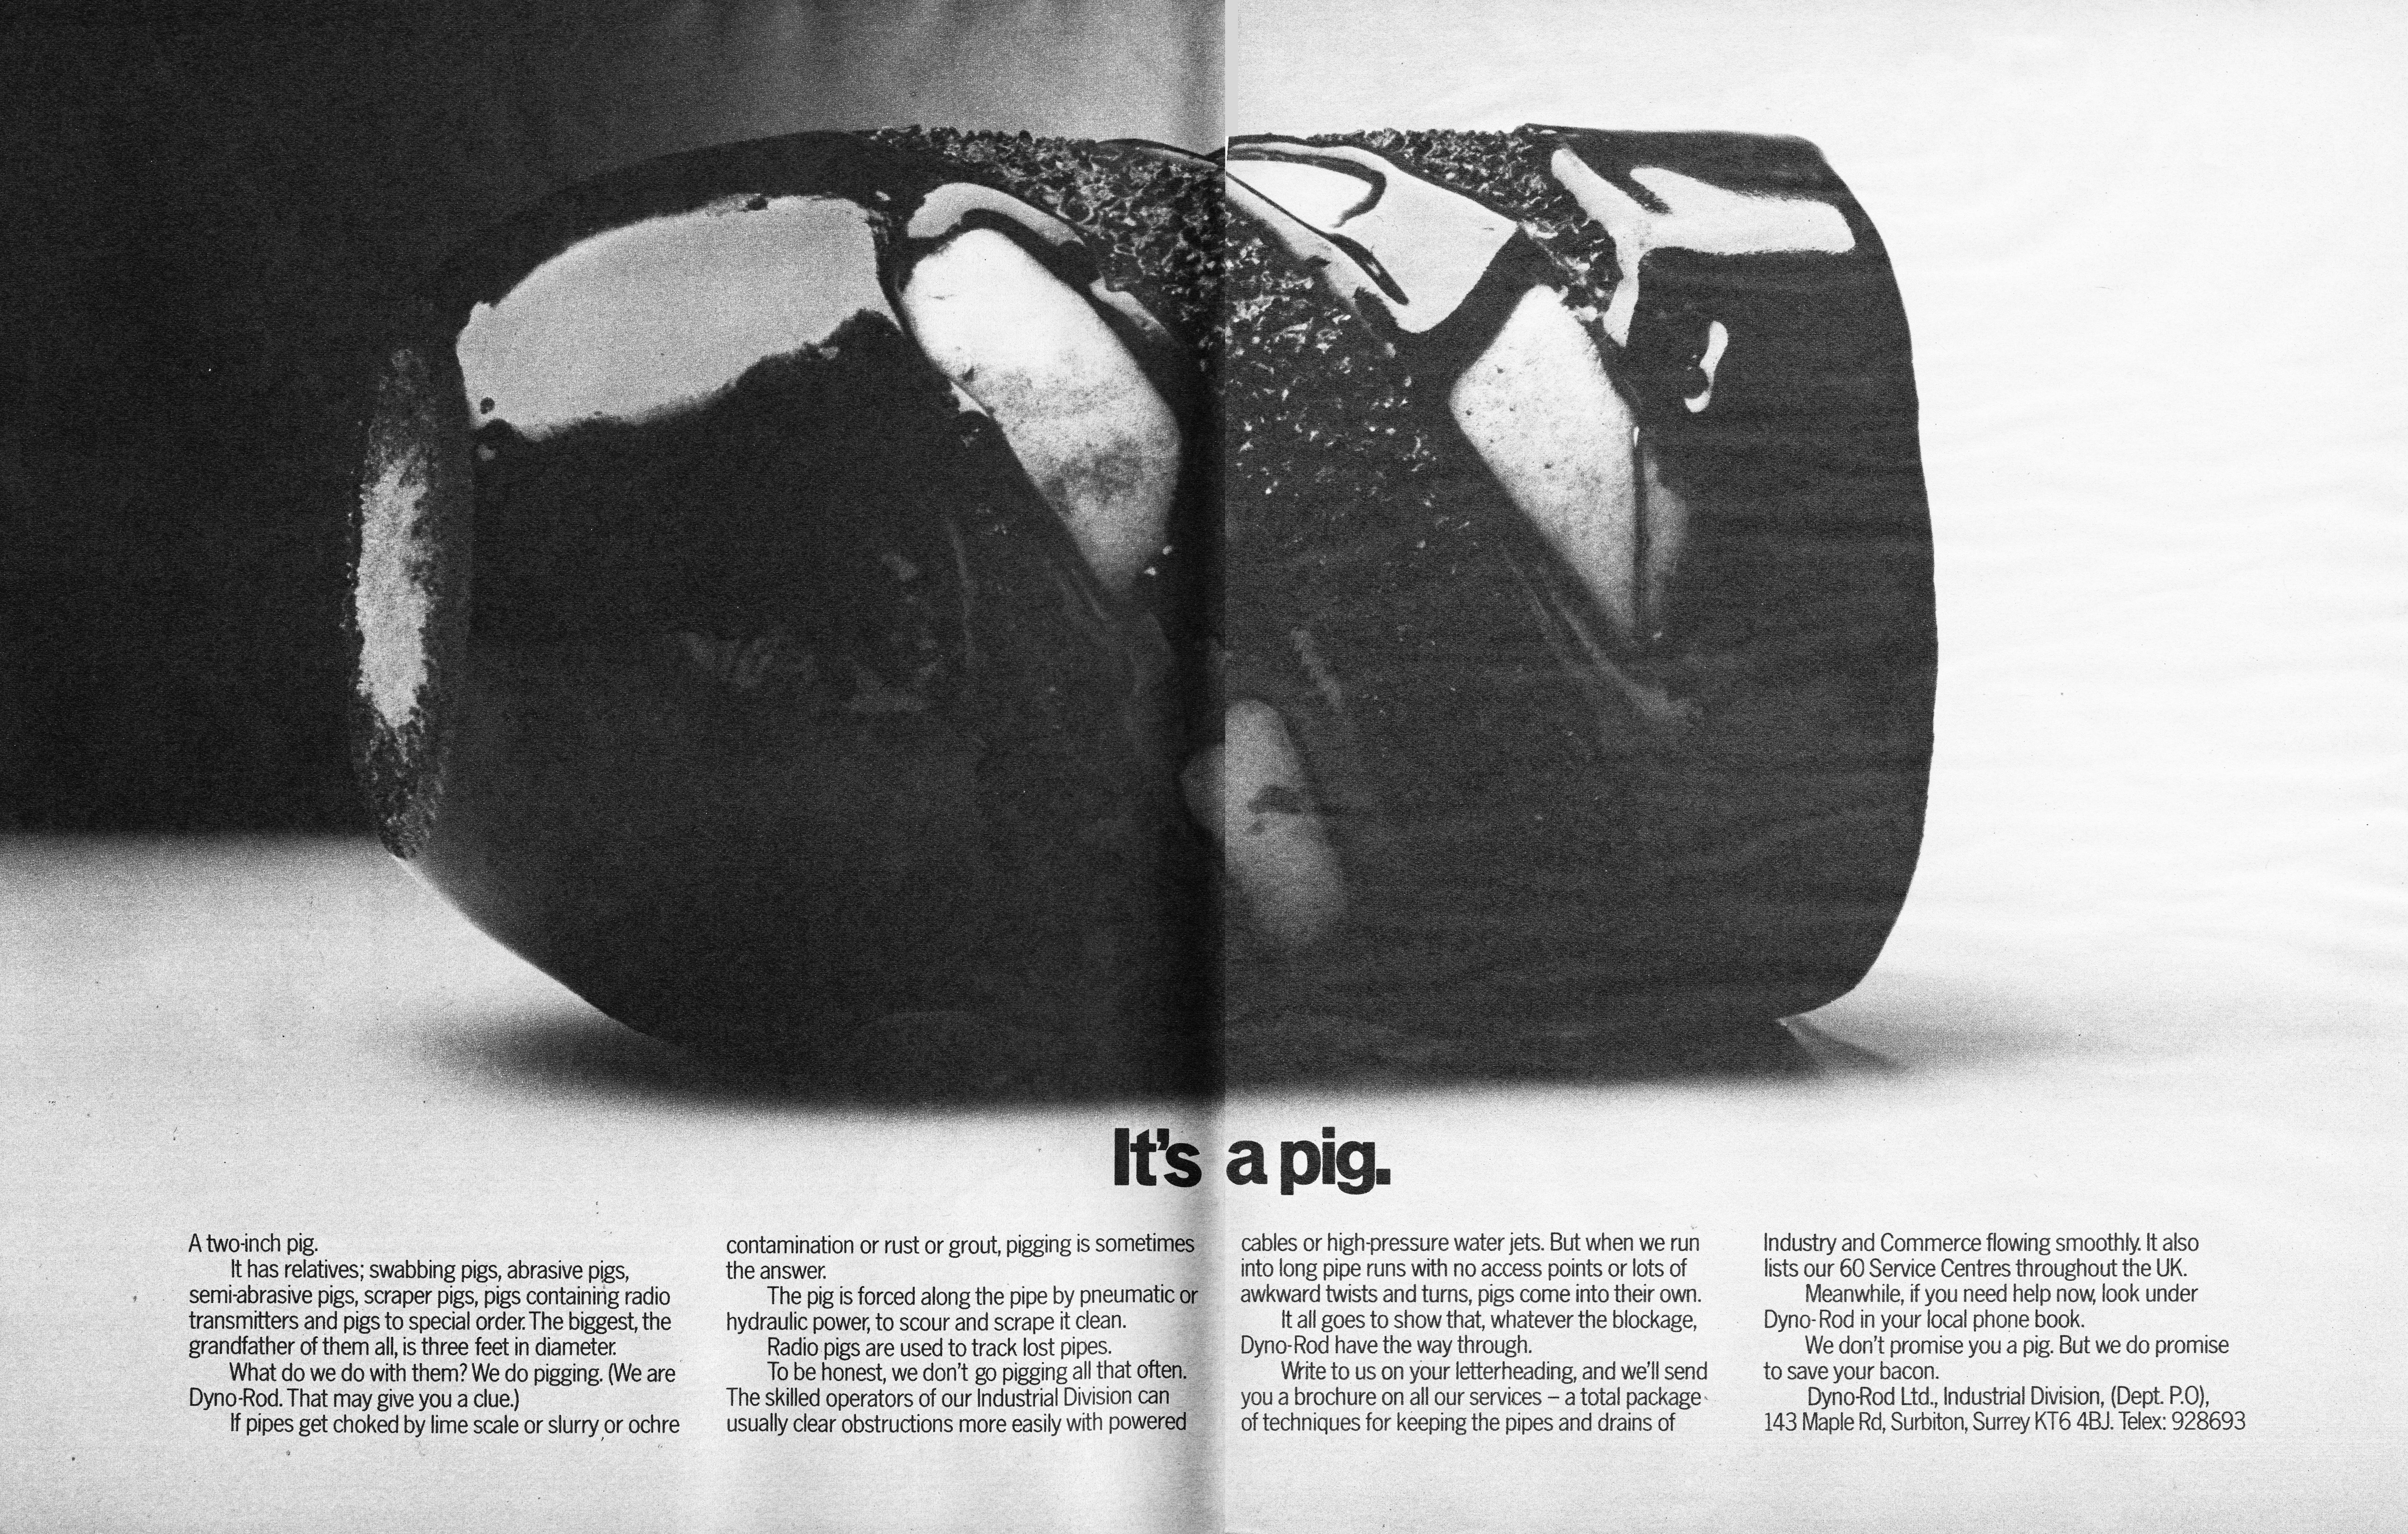 Dynarod 'Pig', David Holmes, HKR-01